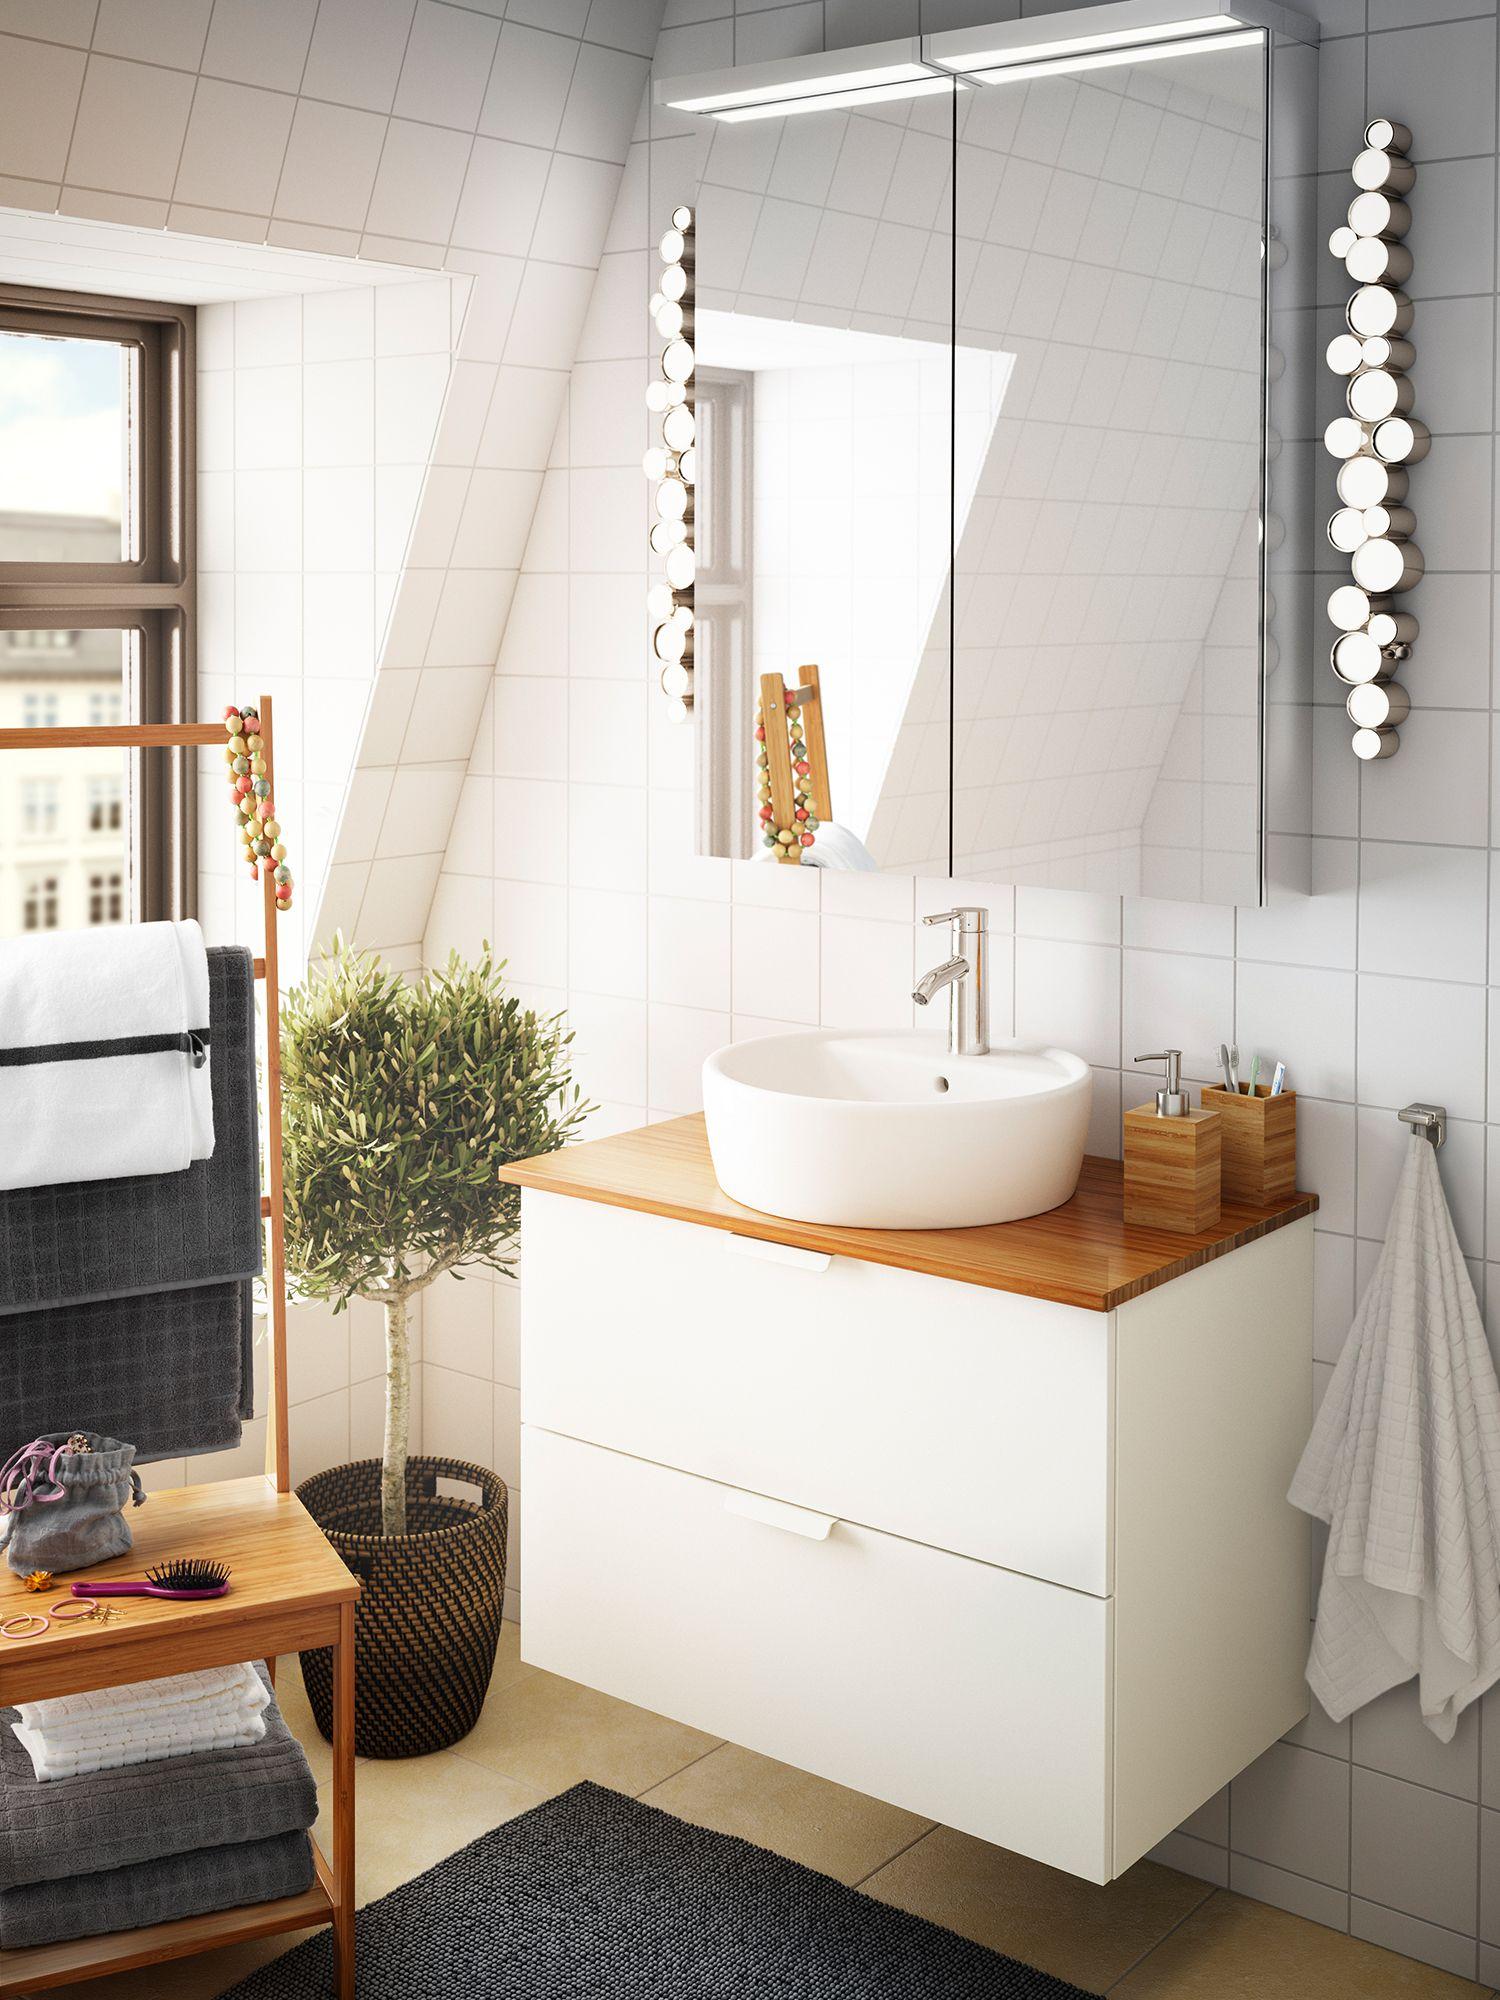 bathroom ideas with do s and don ts in bathroom designs on ikea bathroom vanities id=17161